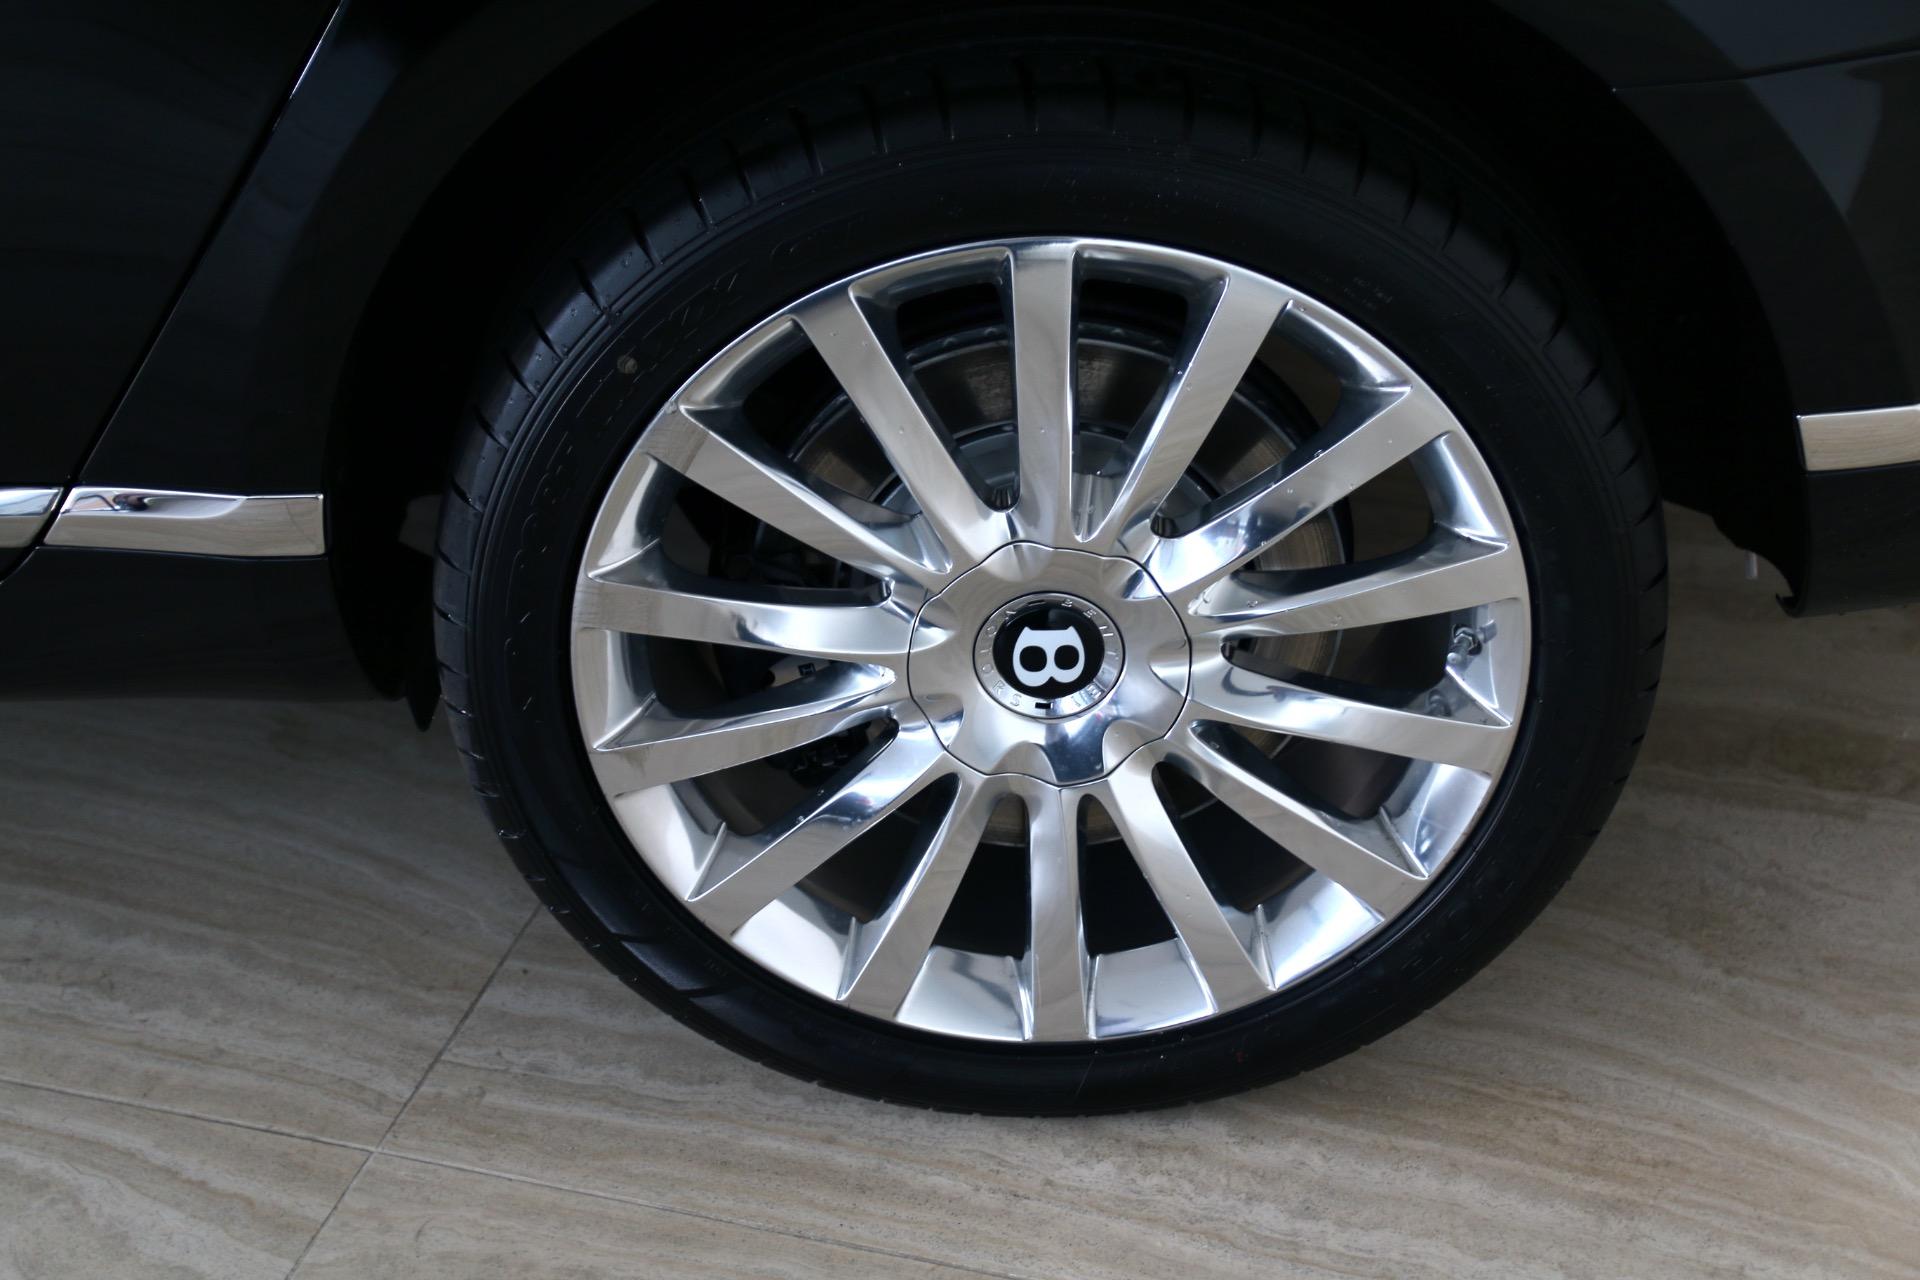 New-2017-Bentley-Mulsanne